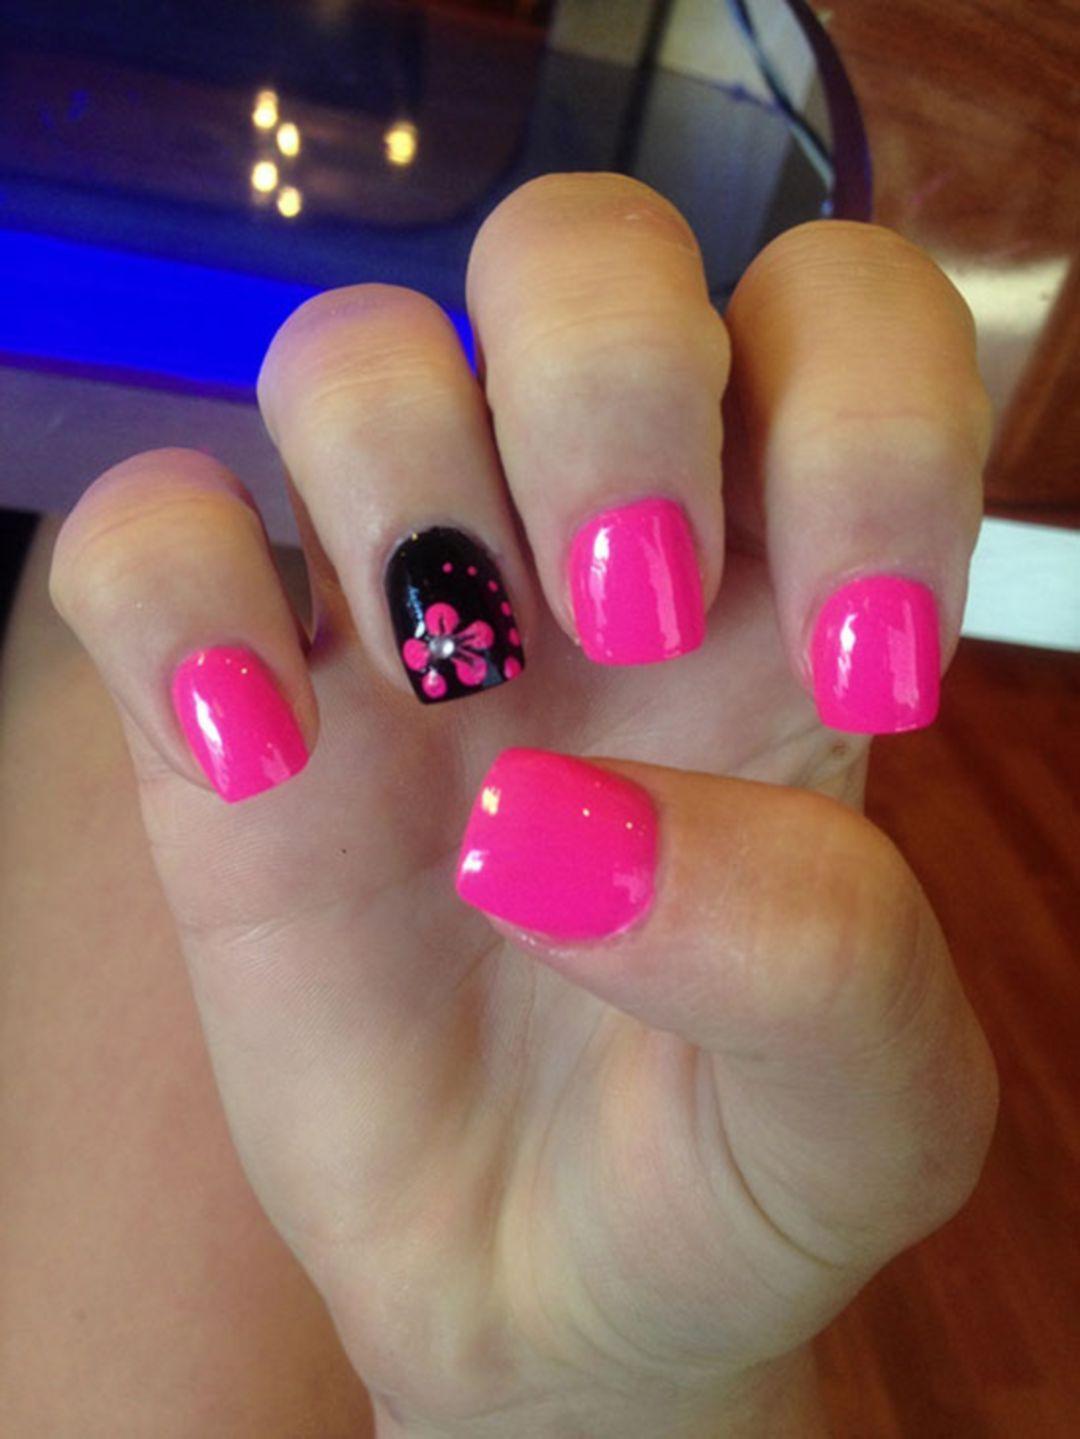 Cute and stylish summer nail art ideas for beautiful women nails